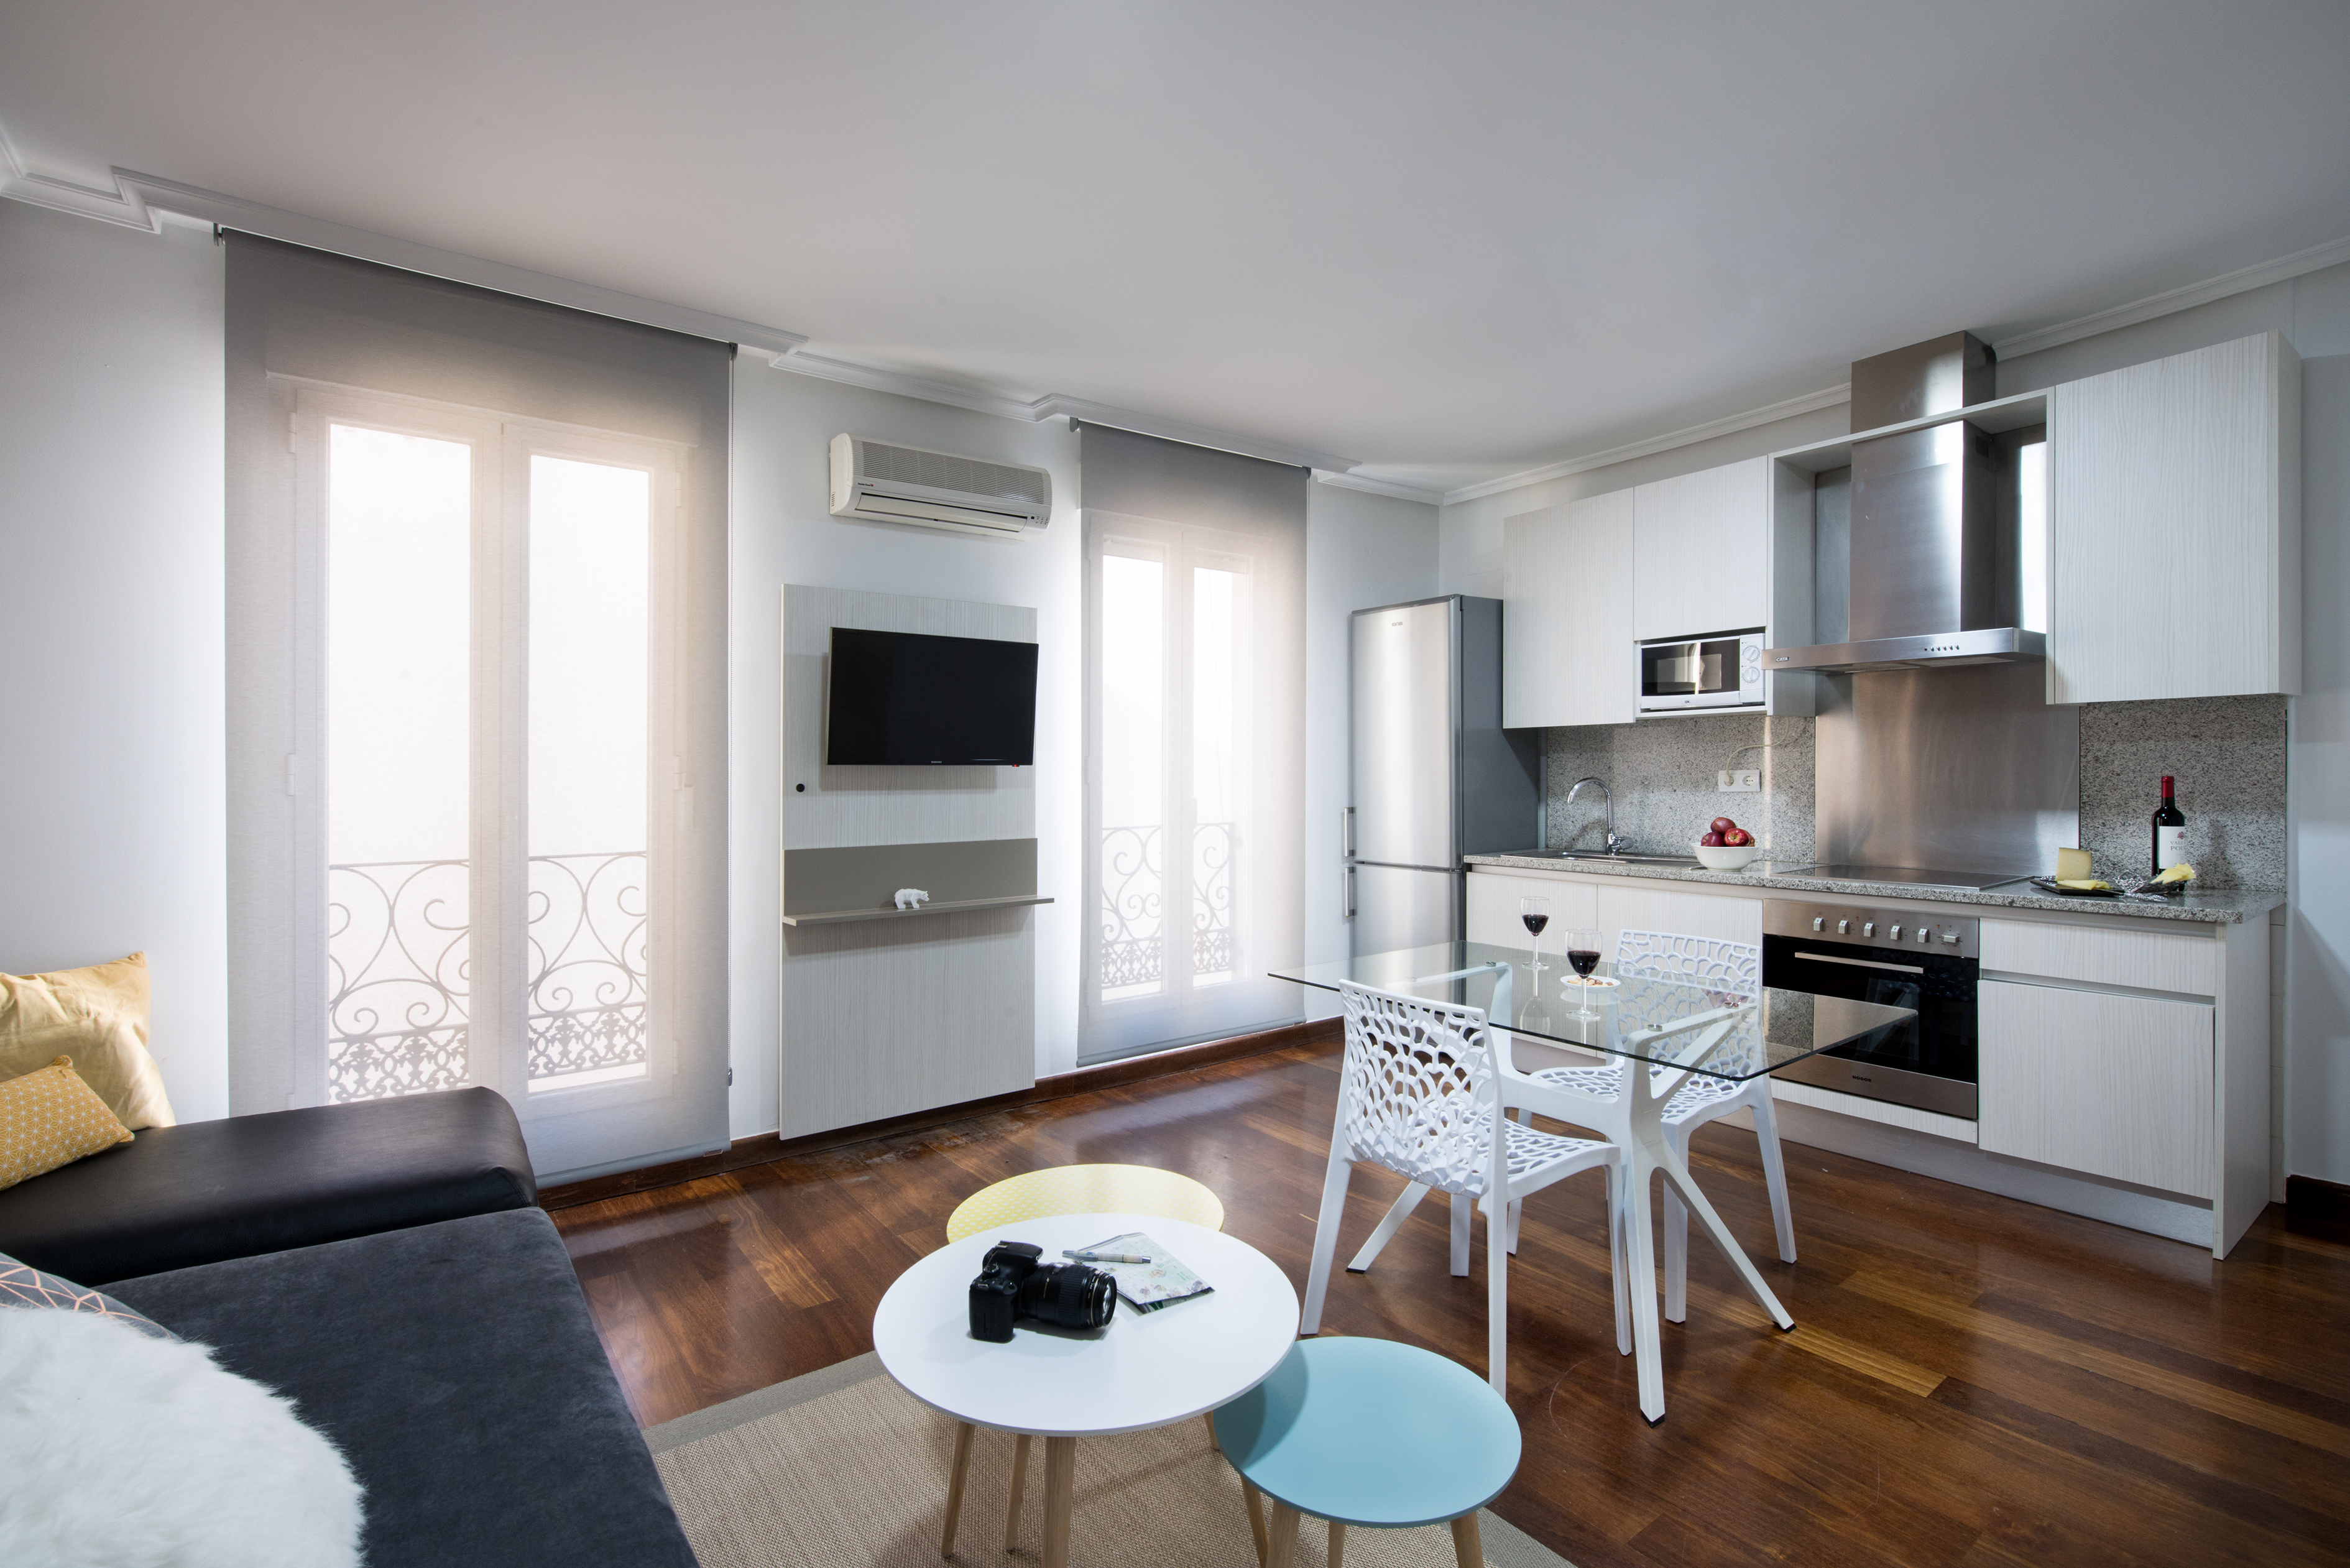 CENTRO apartamento dormitorio1